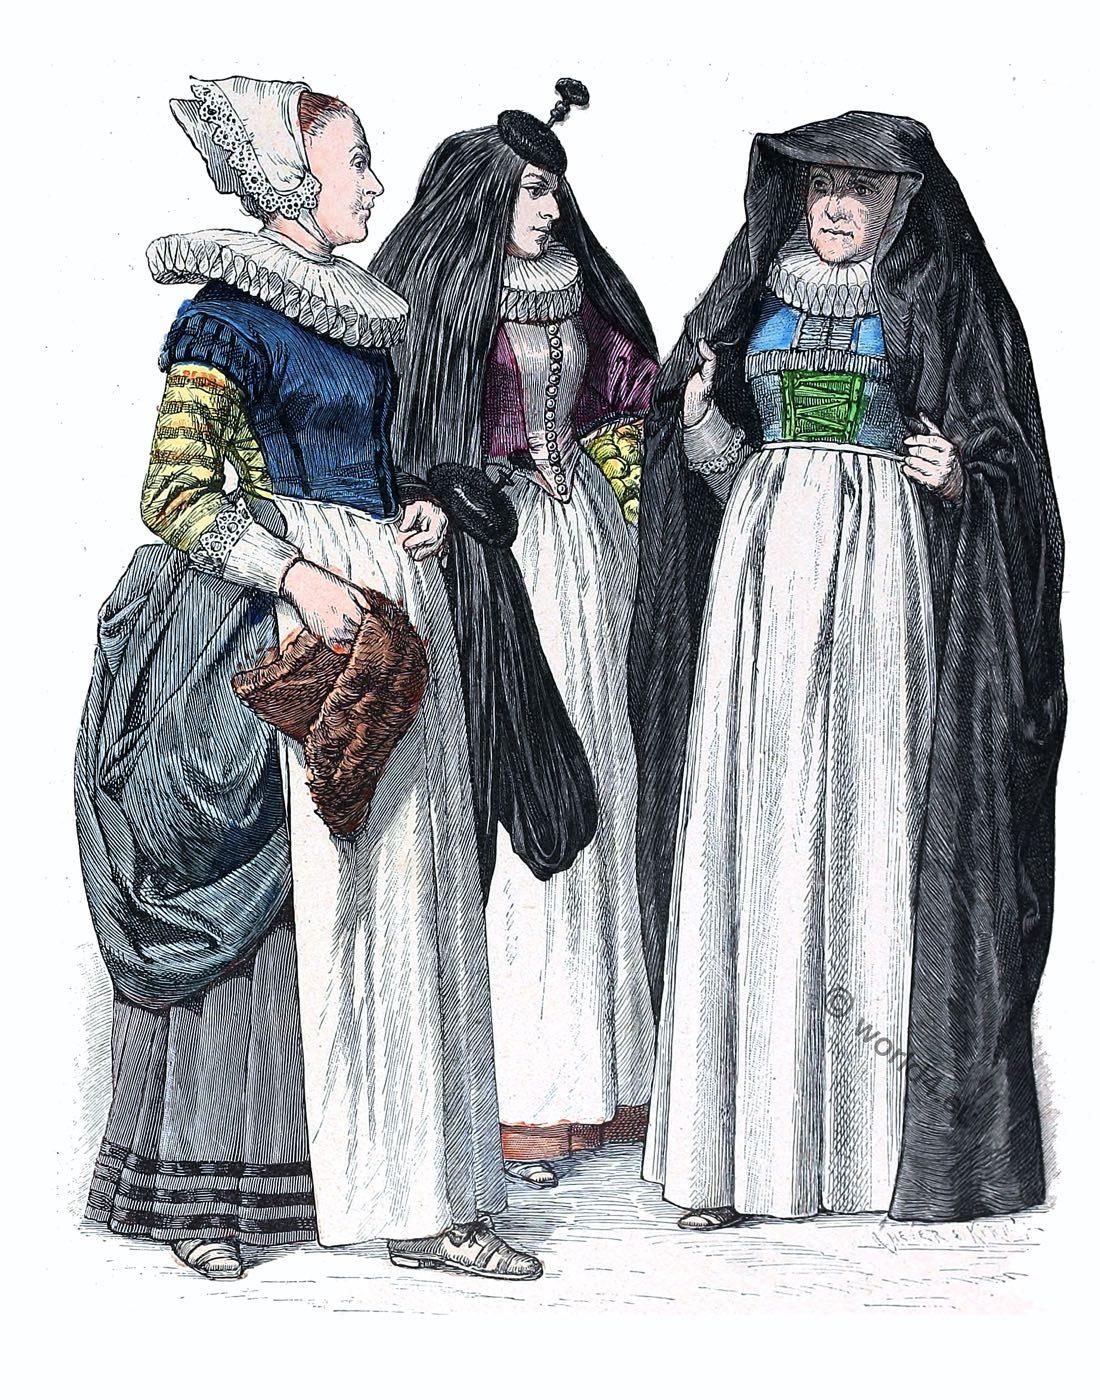 Baroque, fashion, Germany, 17th century, Matron, maid, citizen,